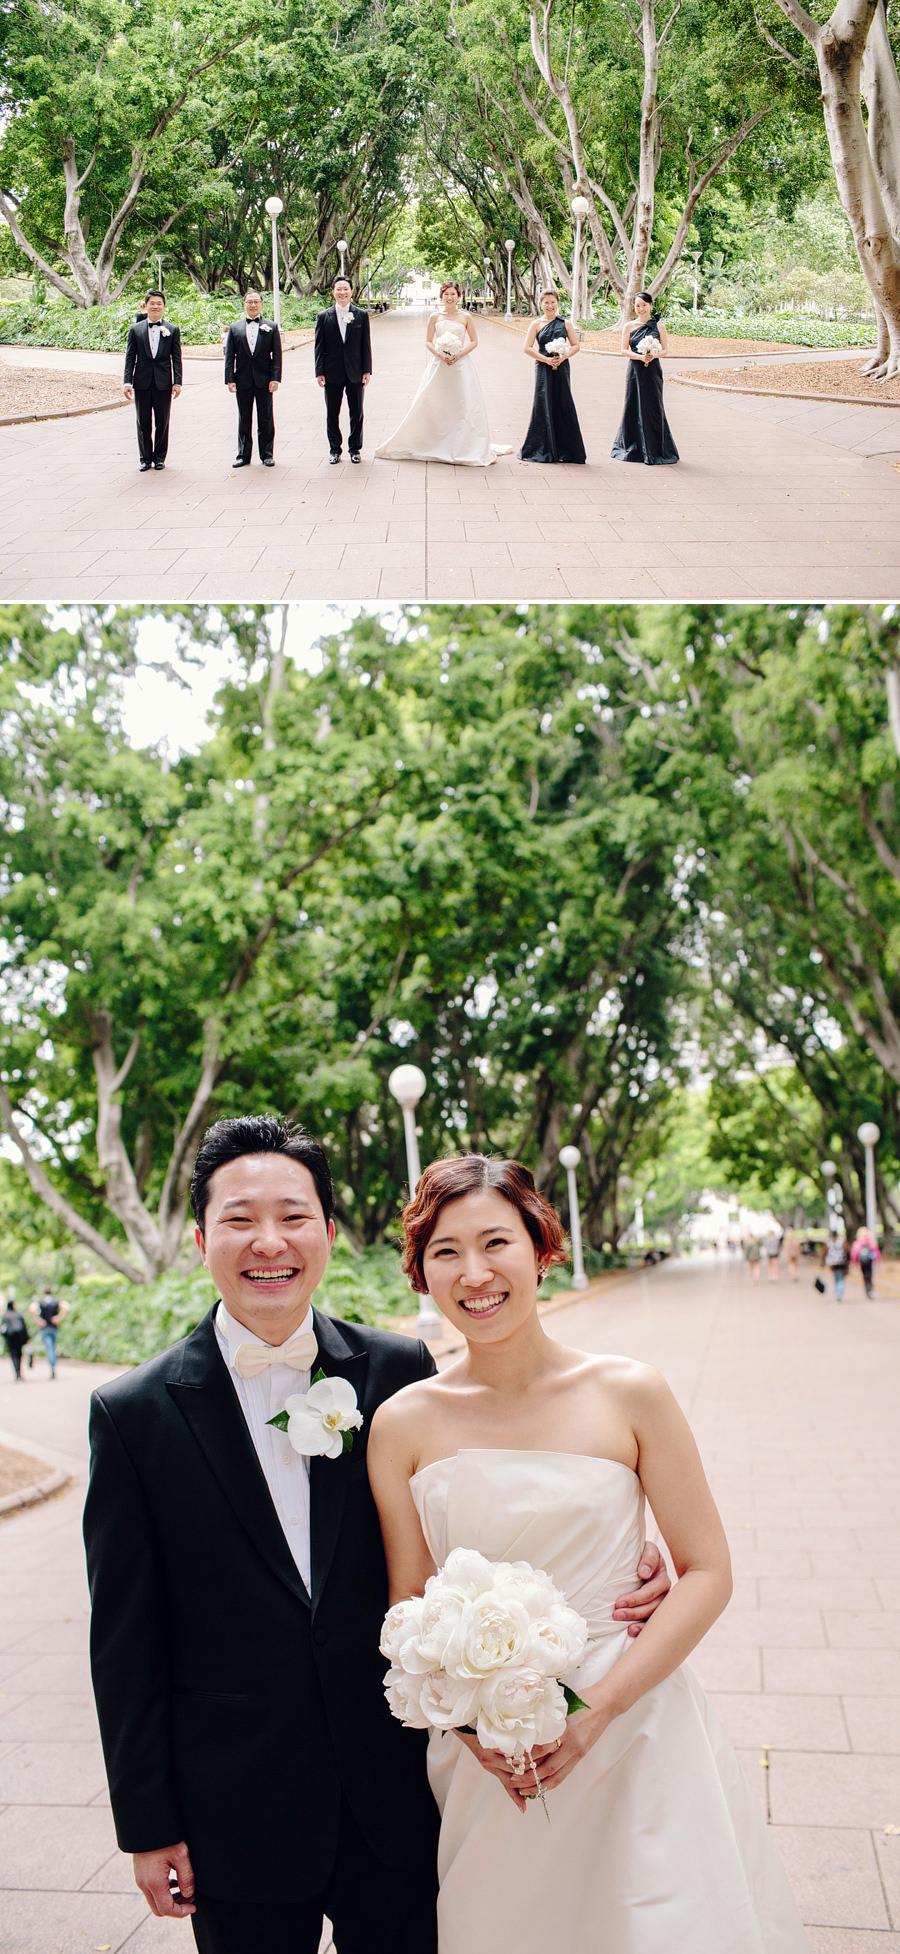 Hyde Park Wedding Photographer: Bridal party portraits